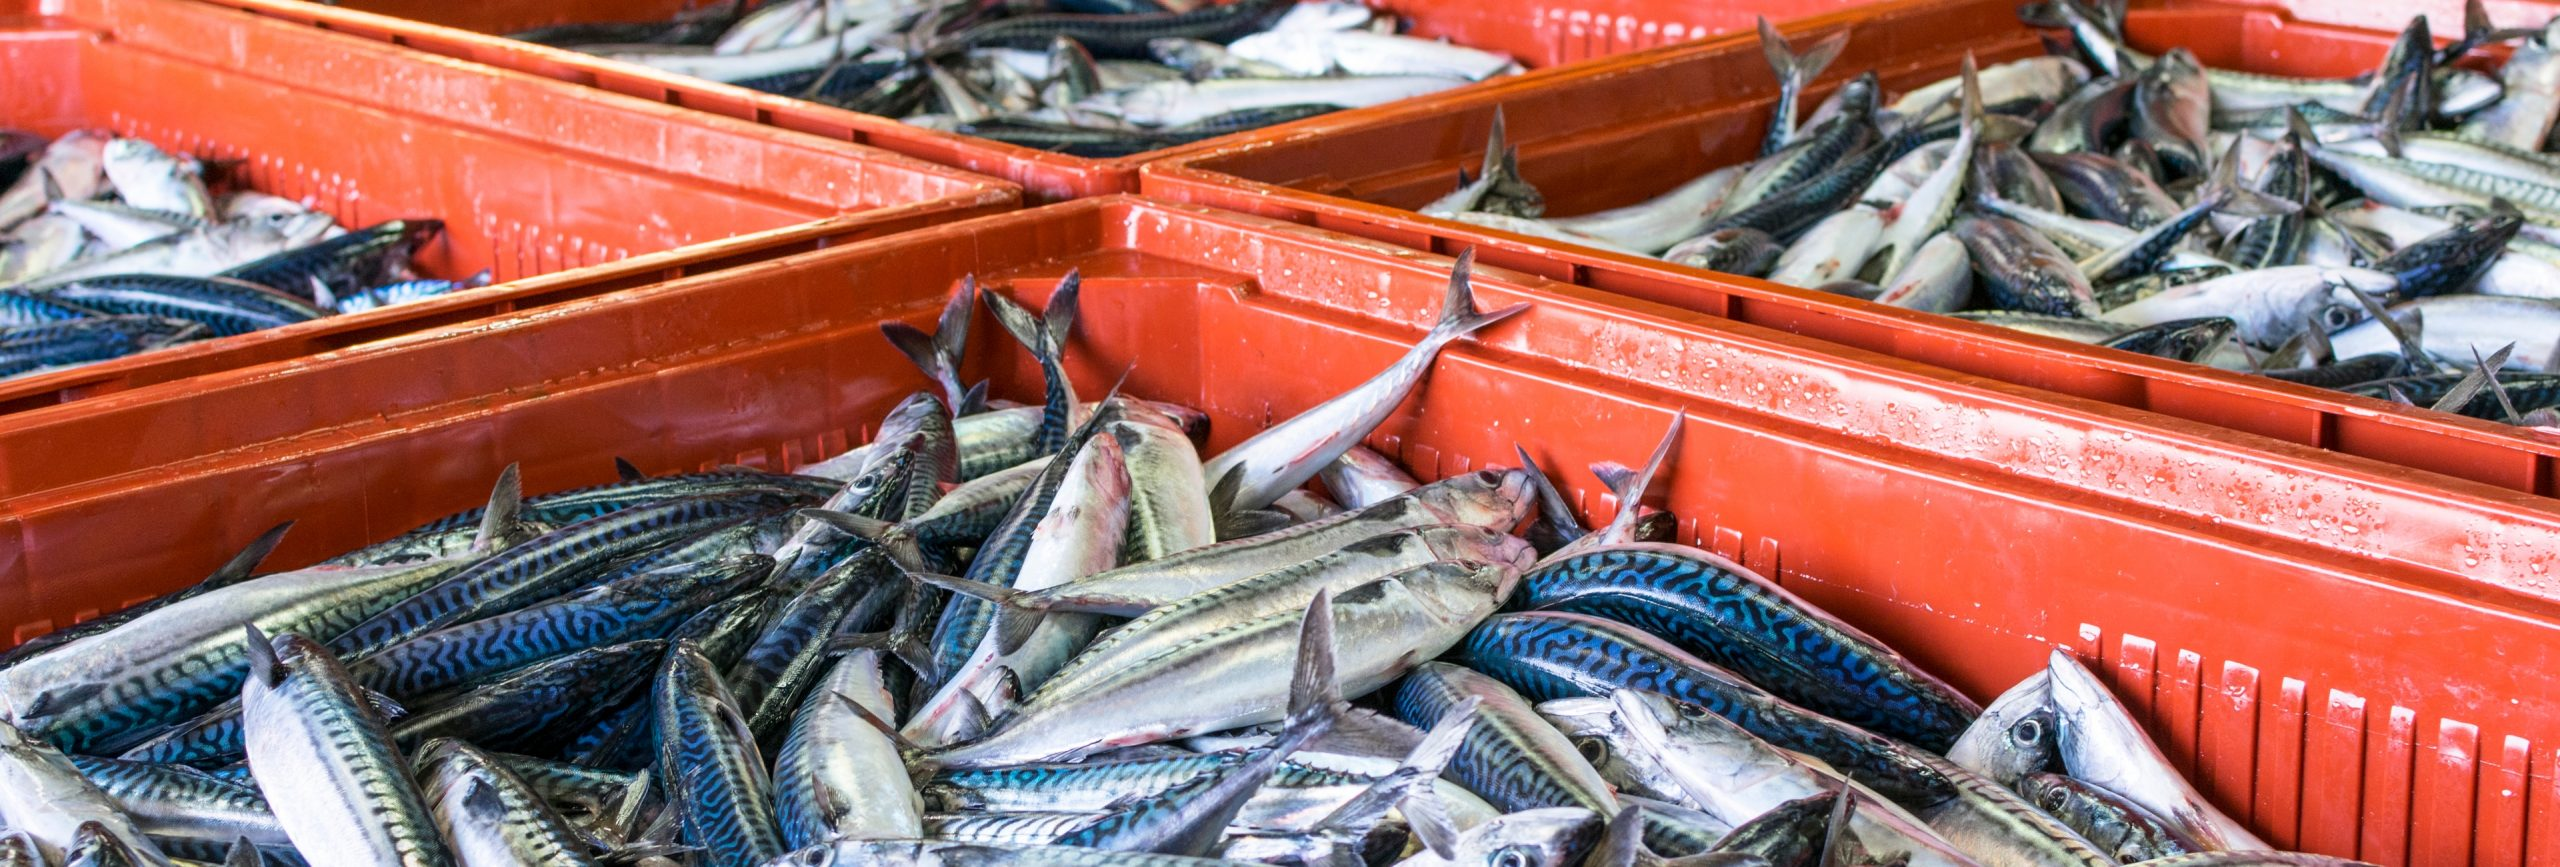 Fish crates on a fish market